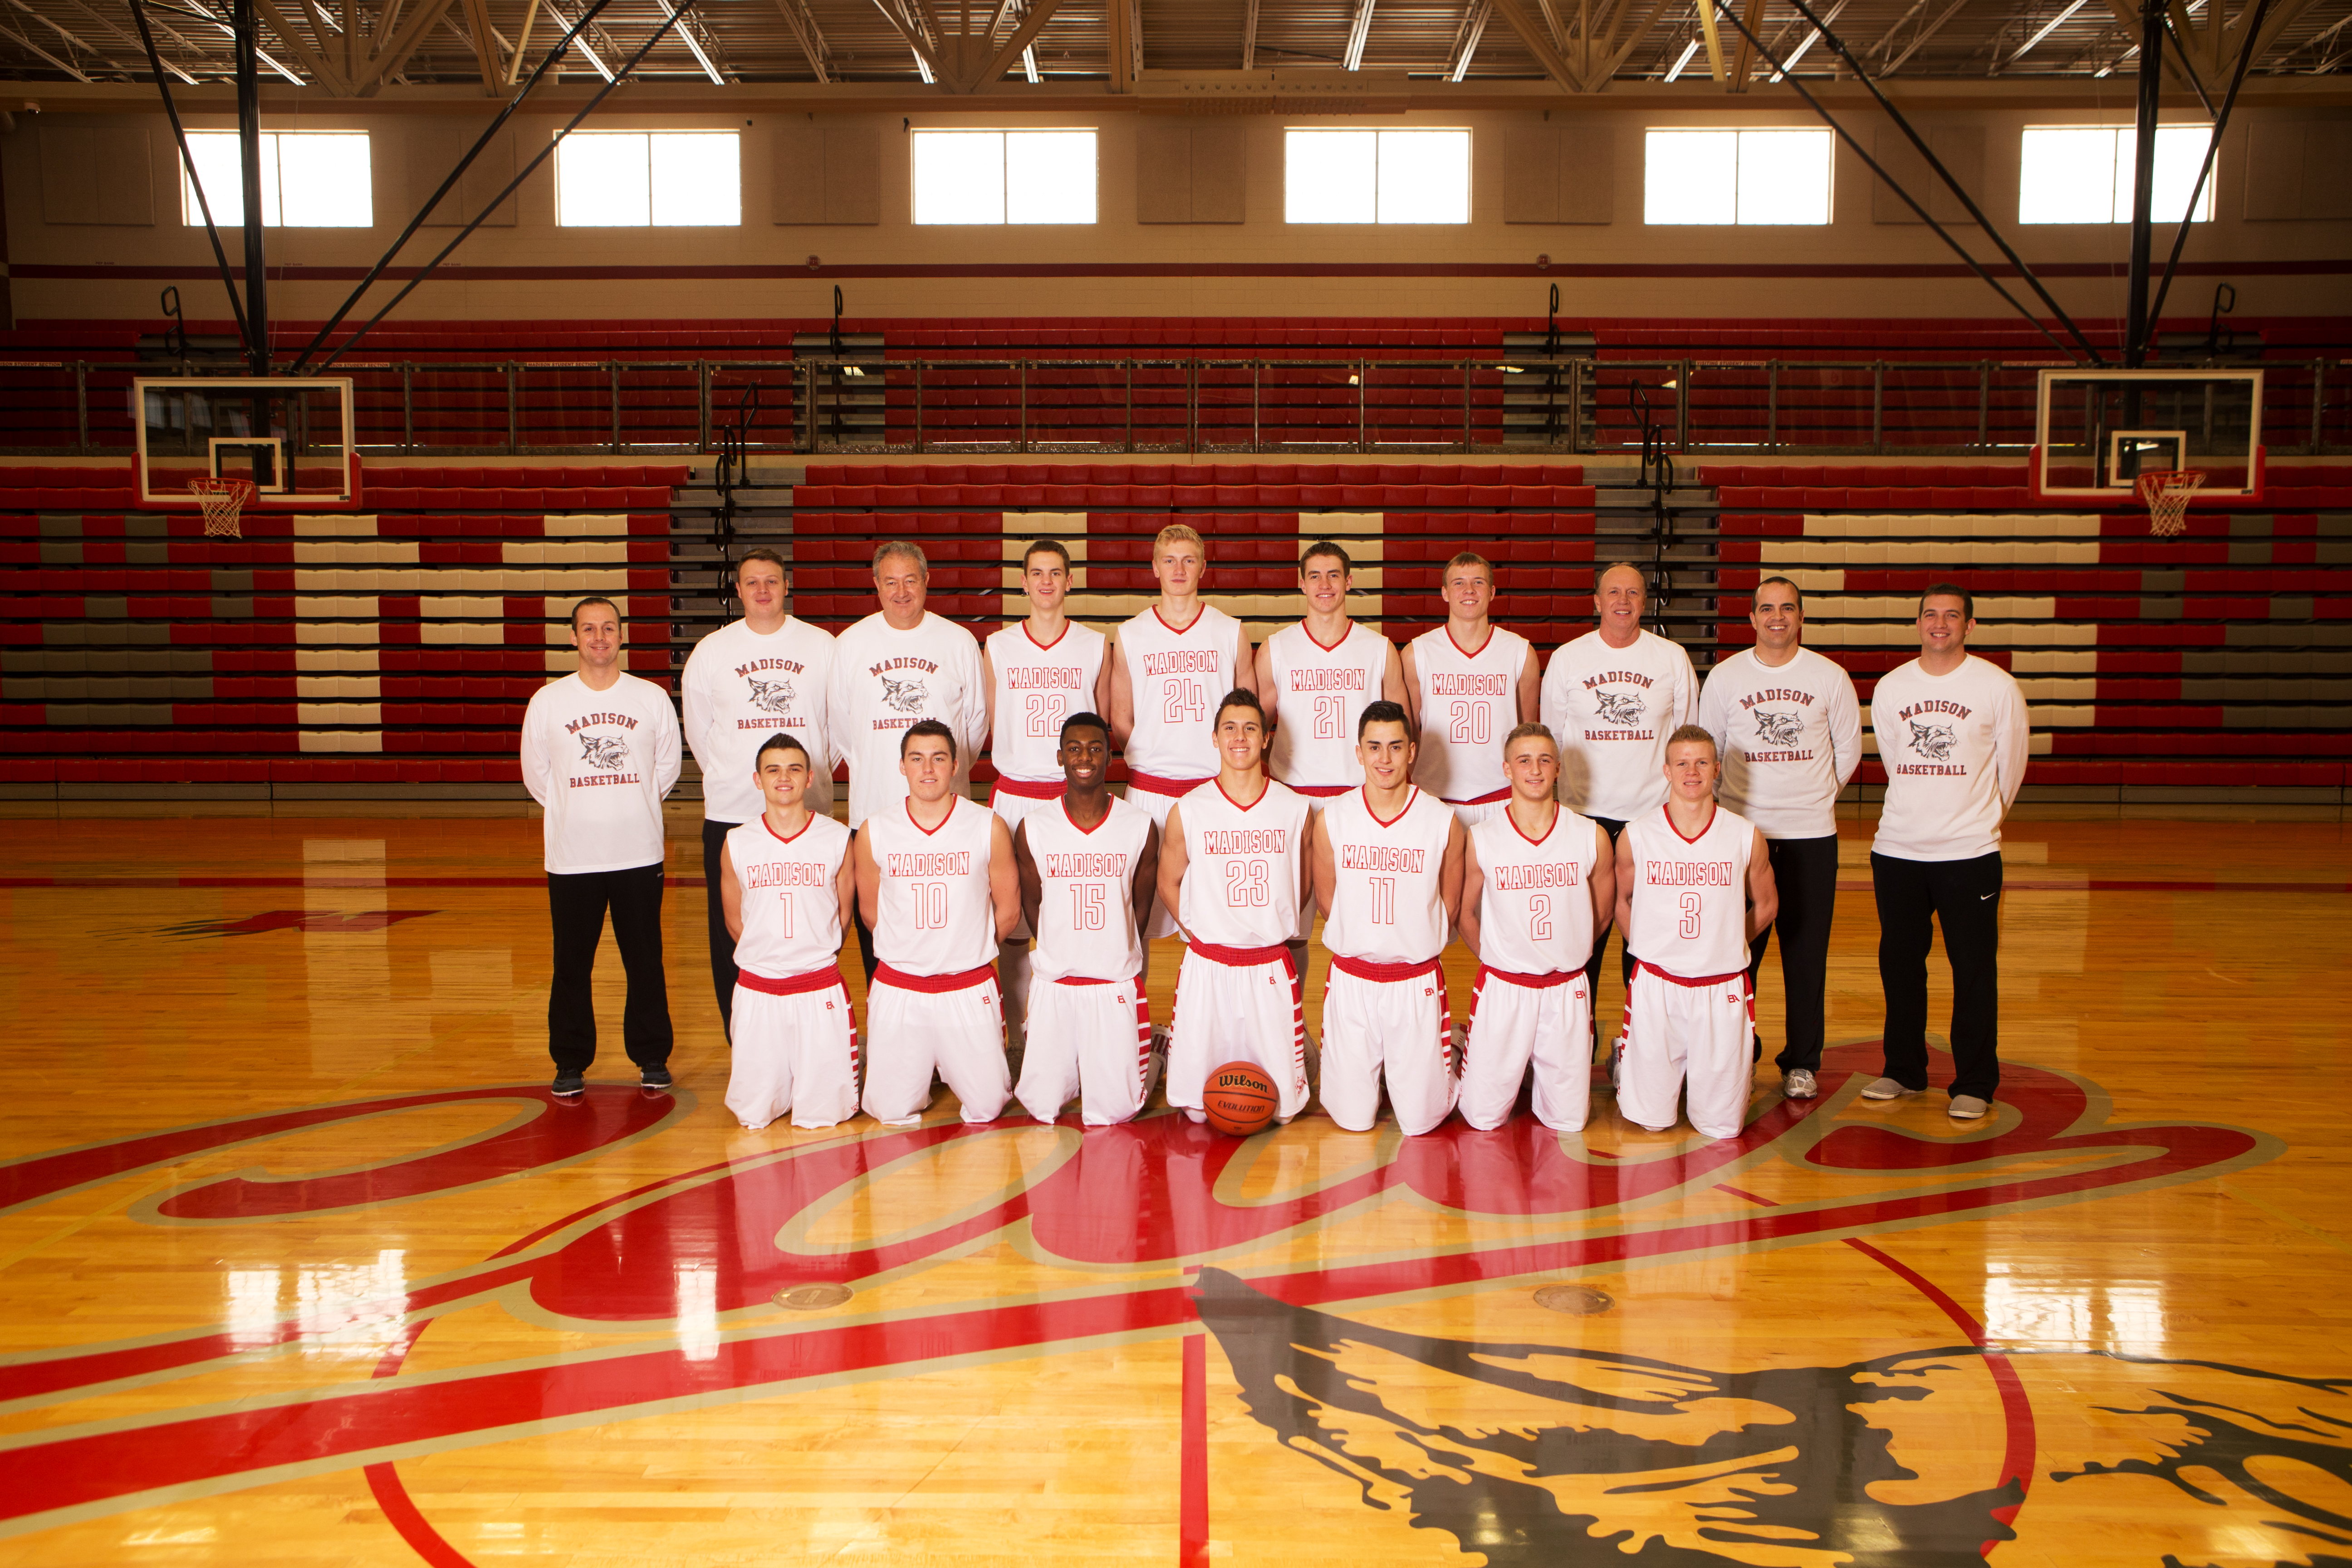 Photo courtesy of Josh Peterson Photography Boy's Varsity Basketball Team